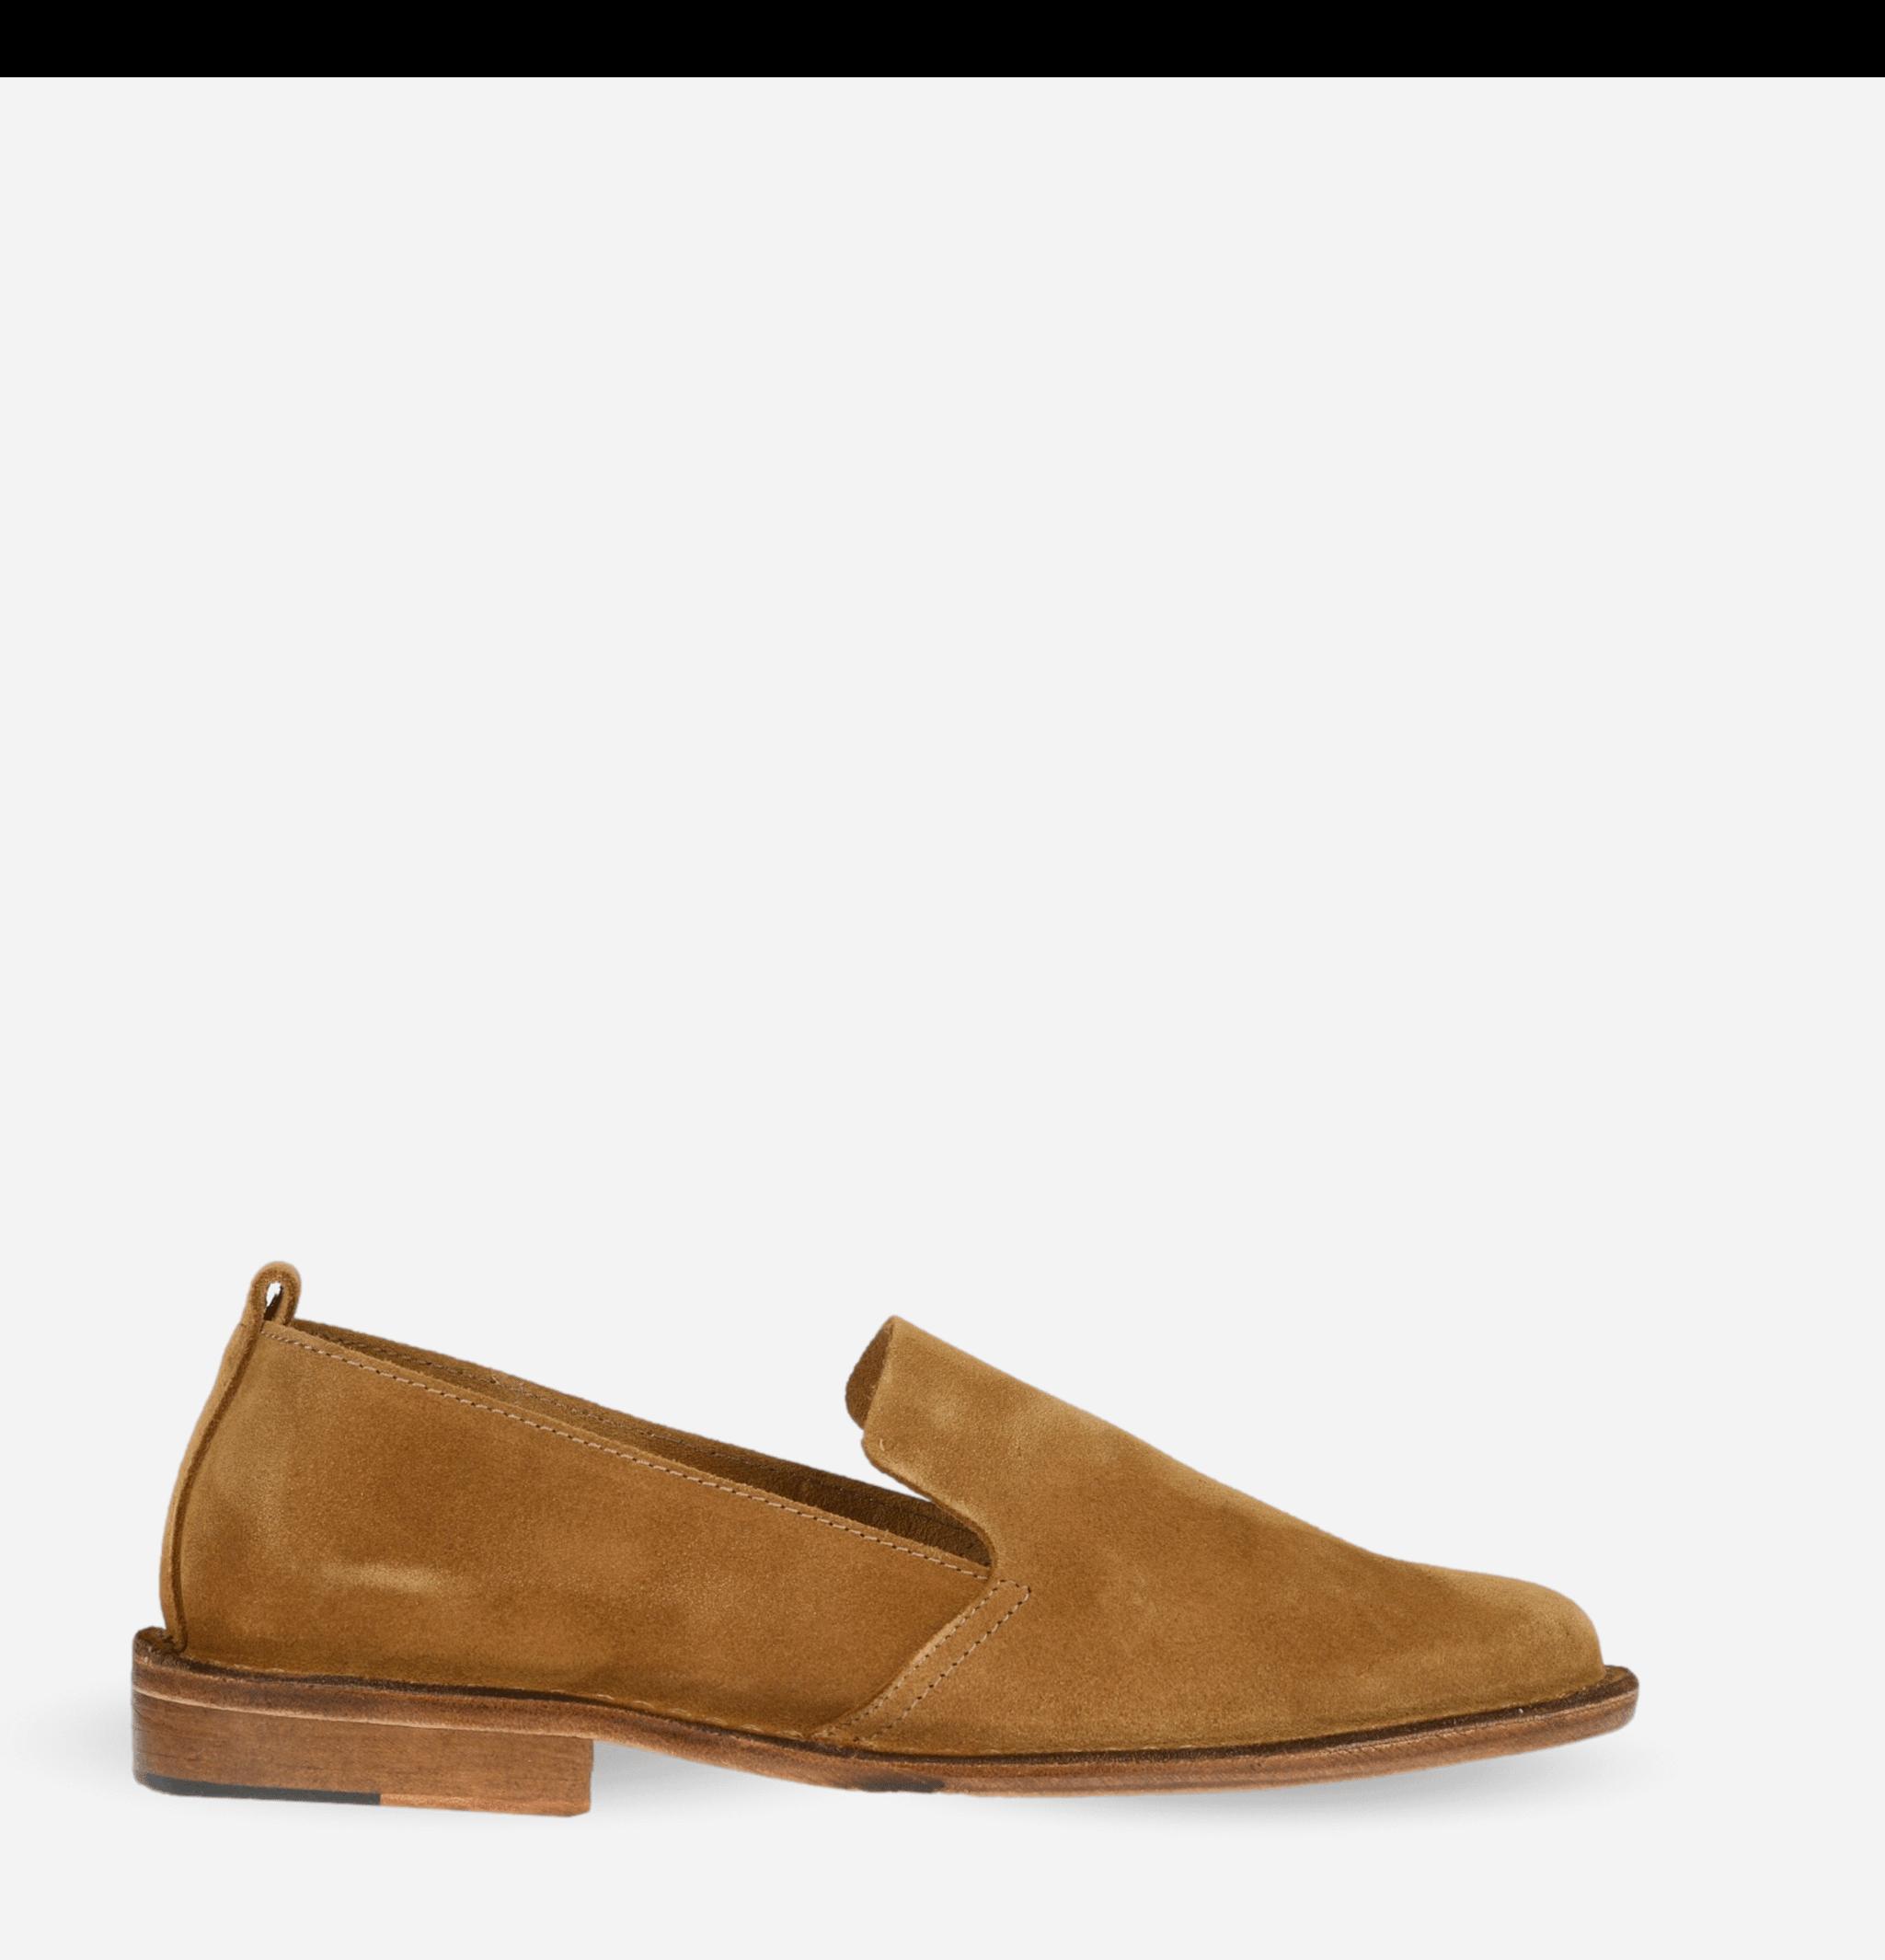 Puntoflex Shoes Whiskey